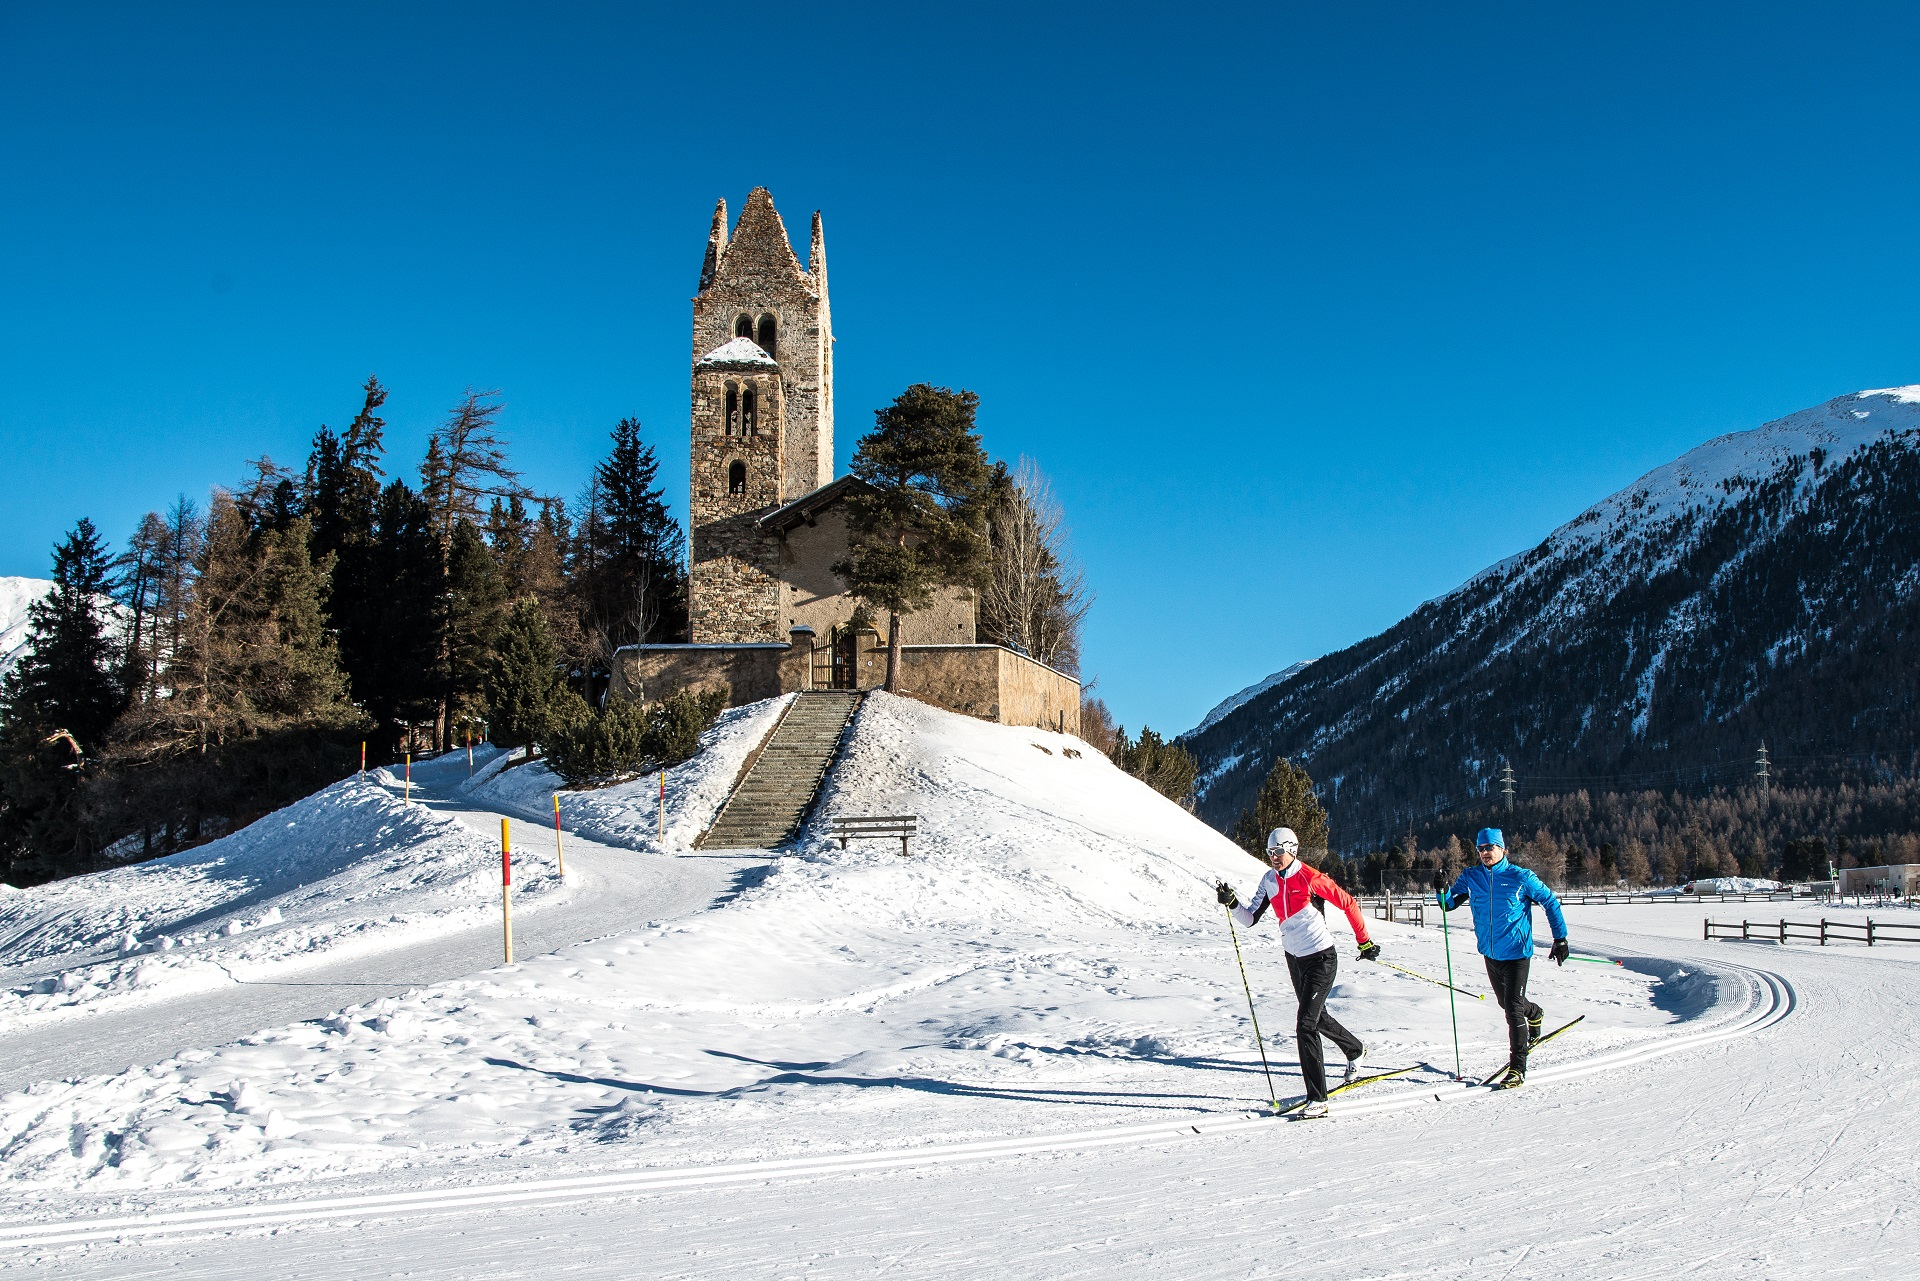 Engandin St Moritz crédito swissimage.ch Salis Romano